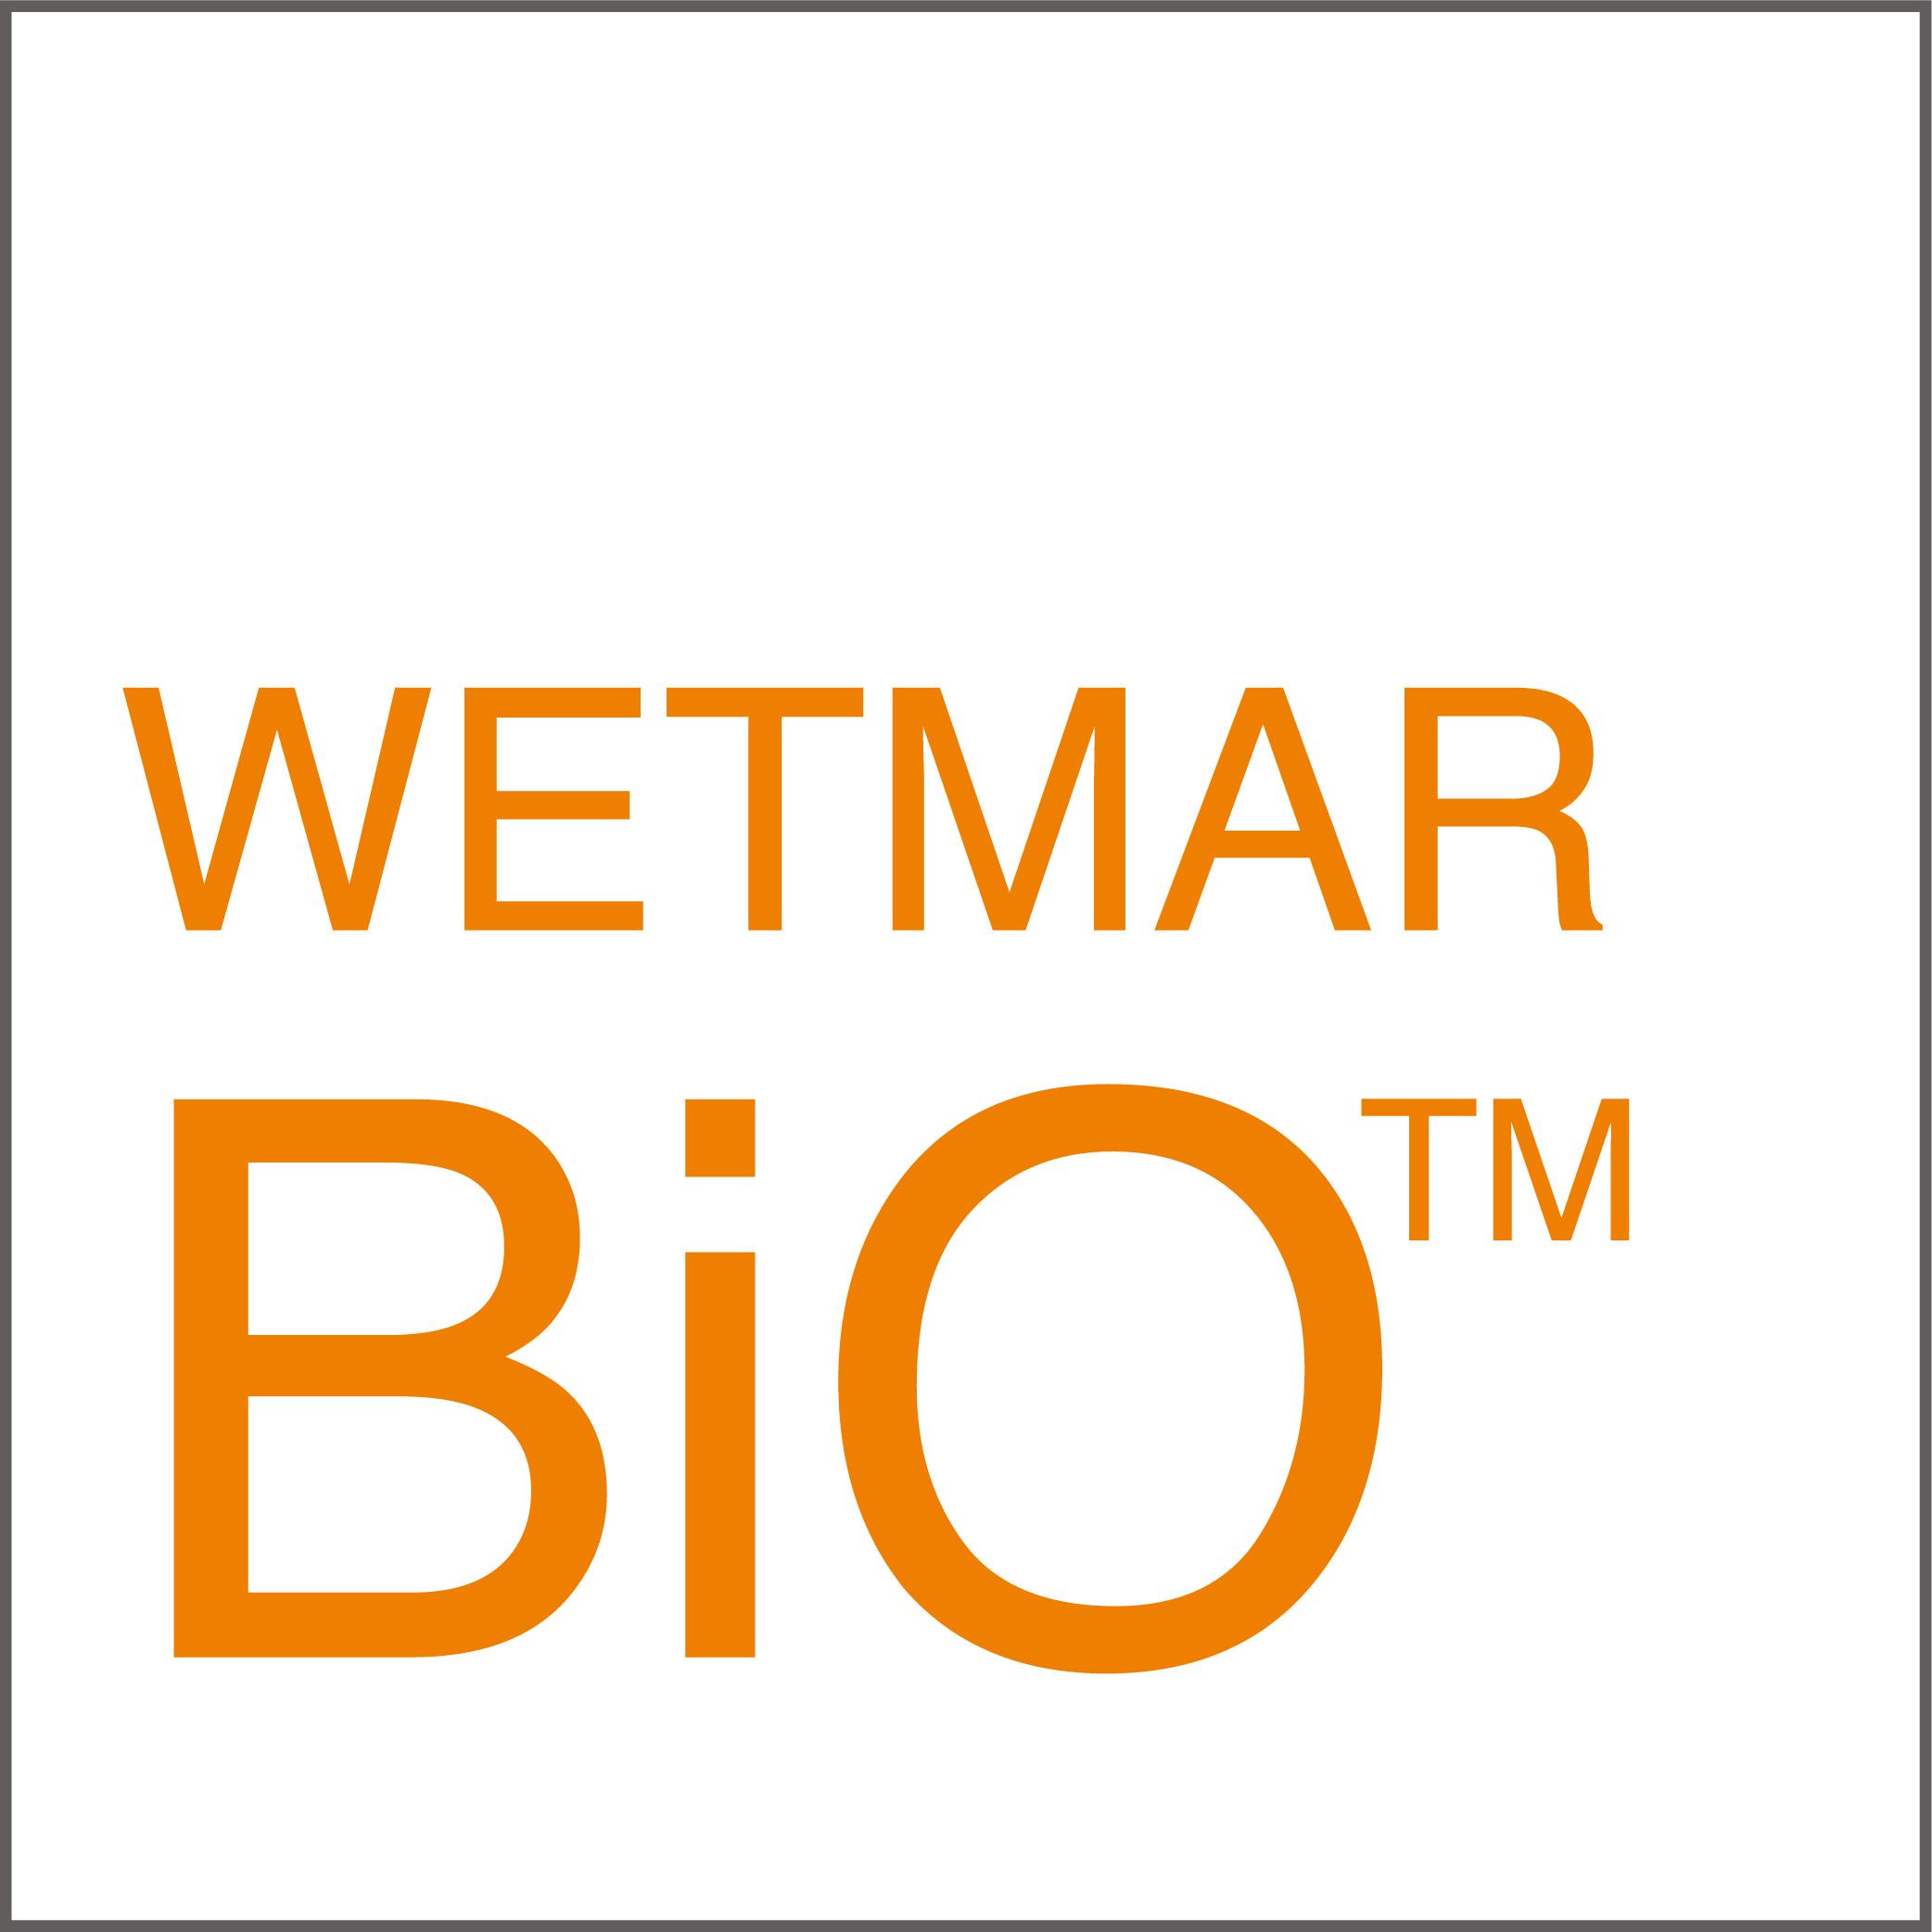 wetmar-bio